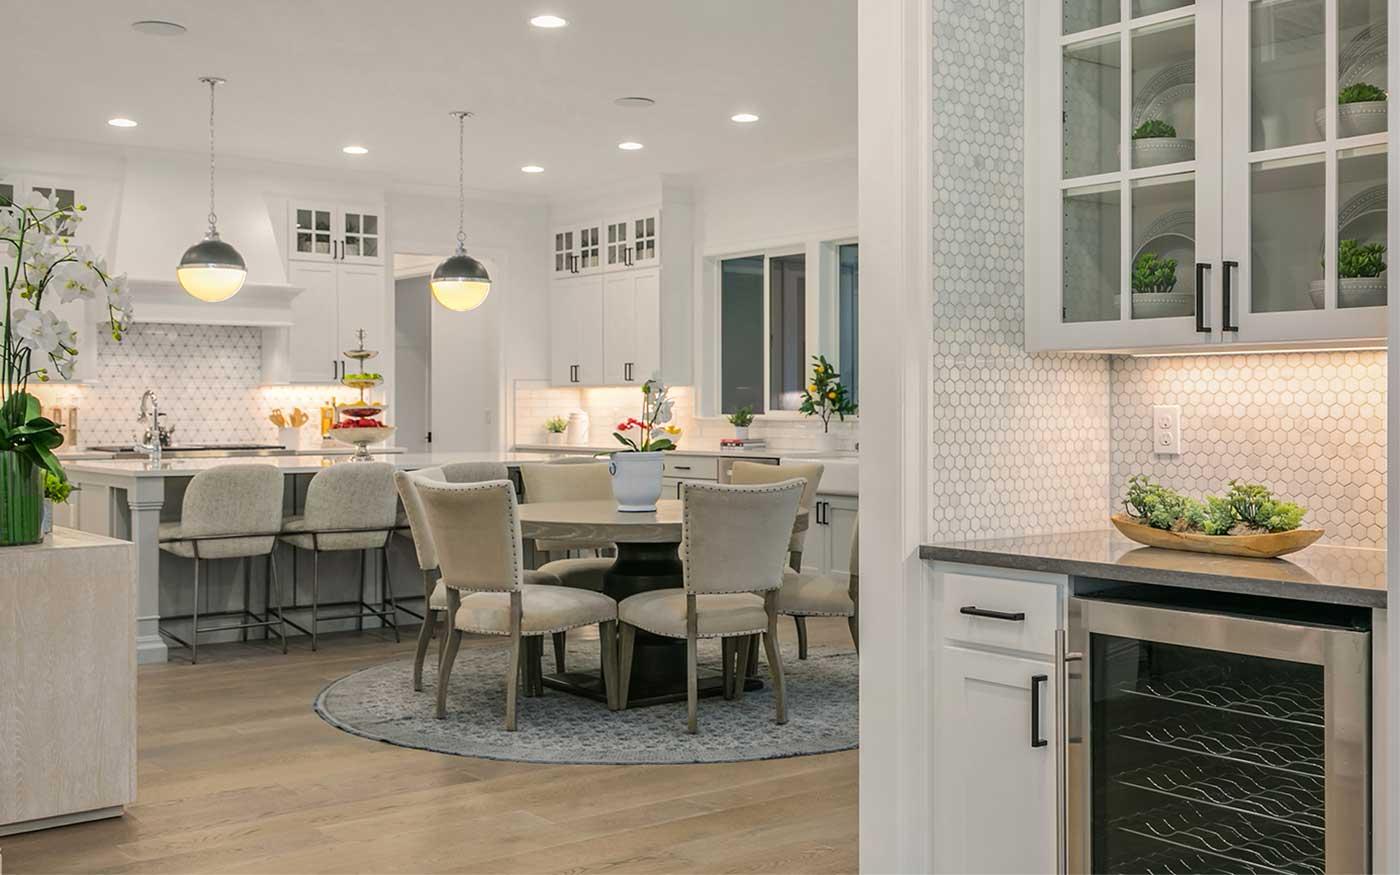 MN Custom Homes Different by Design Slideshow 4